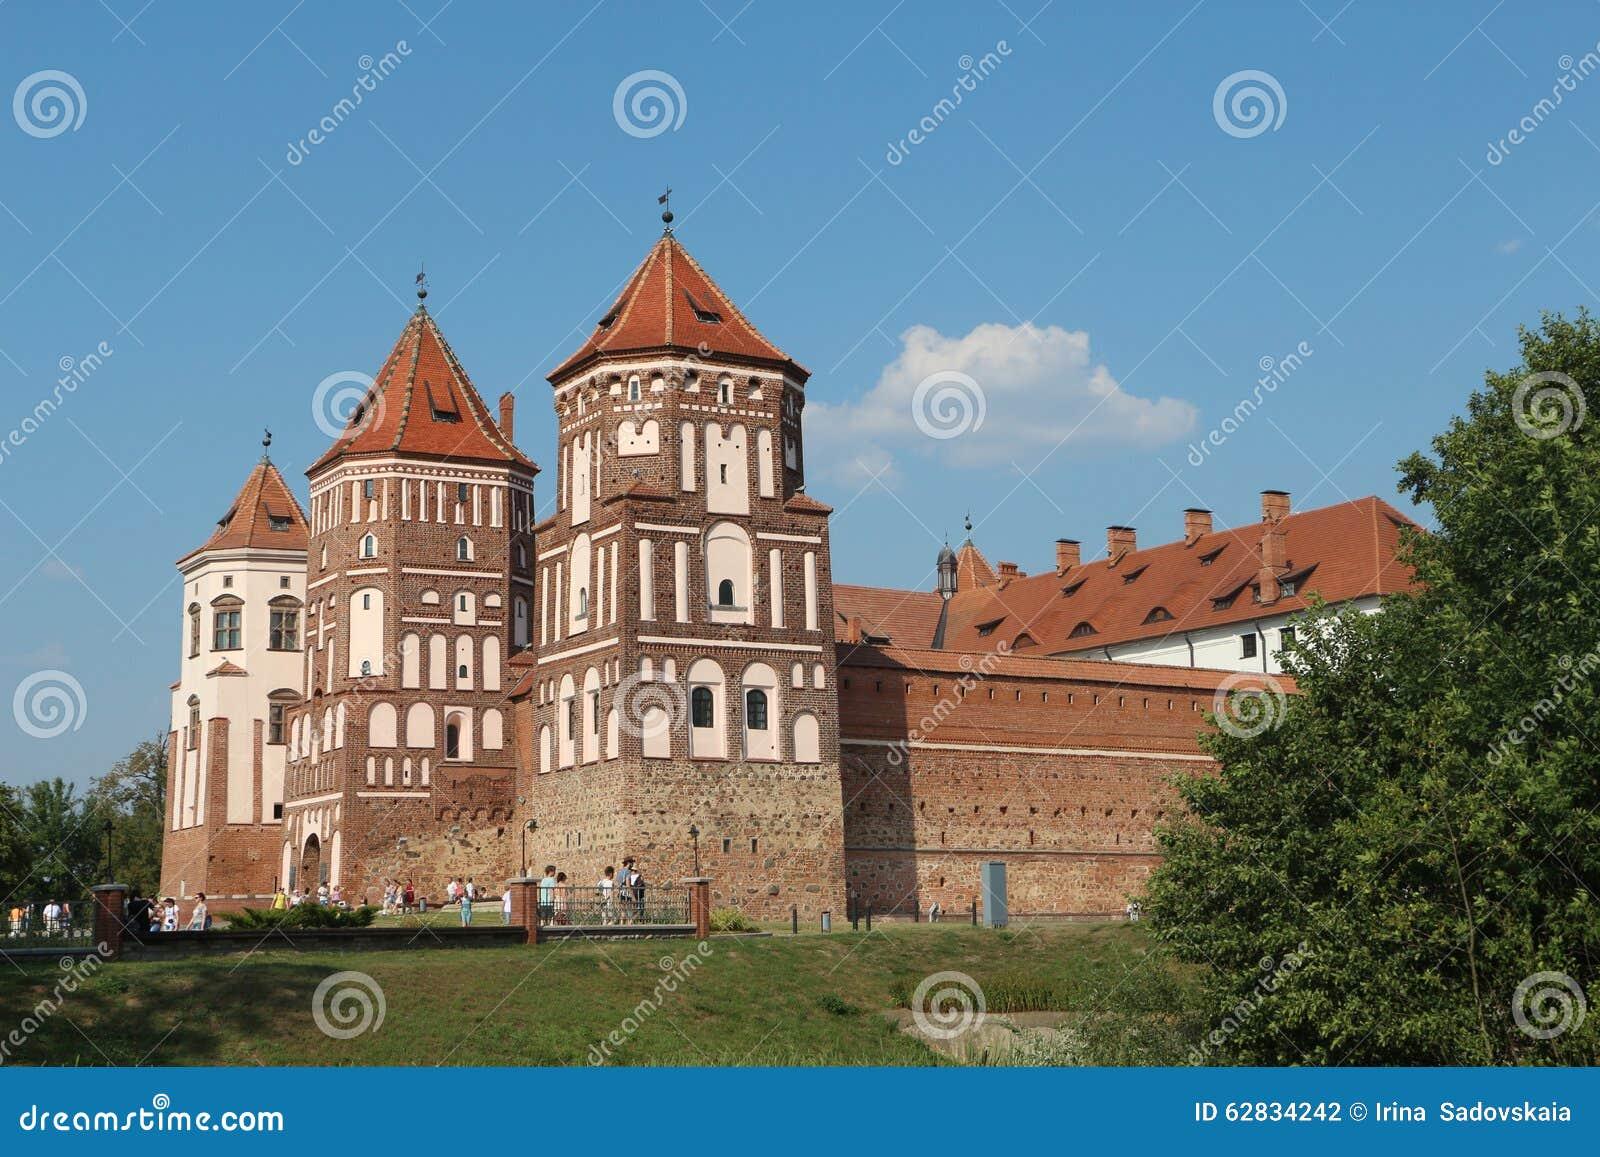 Прогулка с земным замком в Беларуси